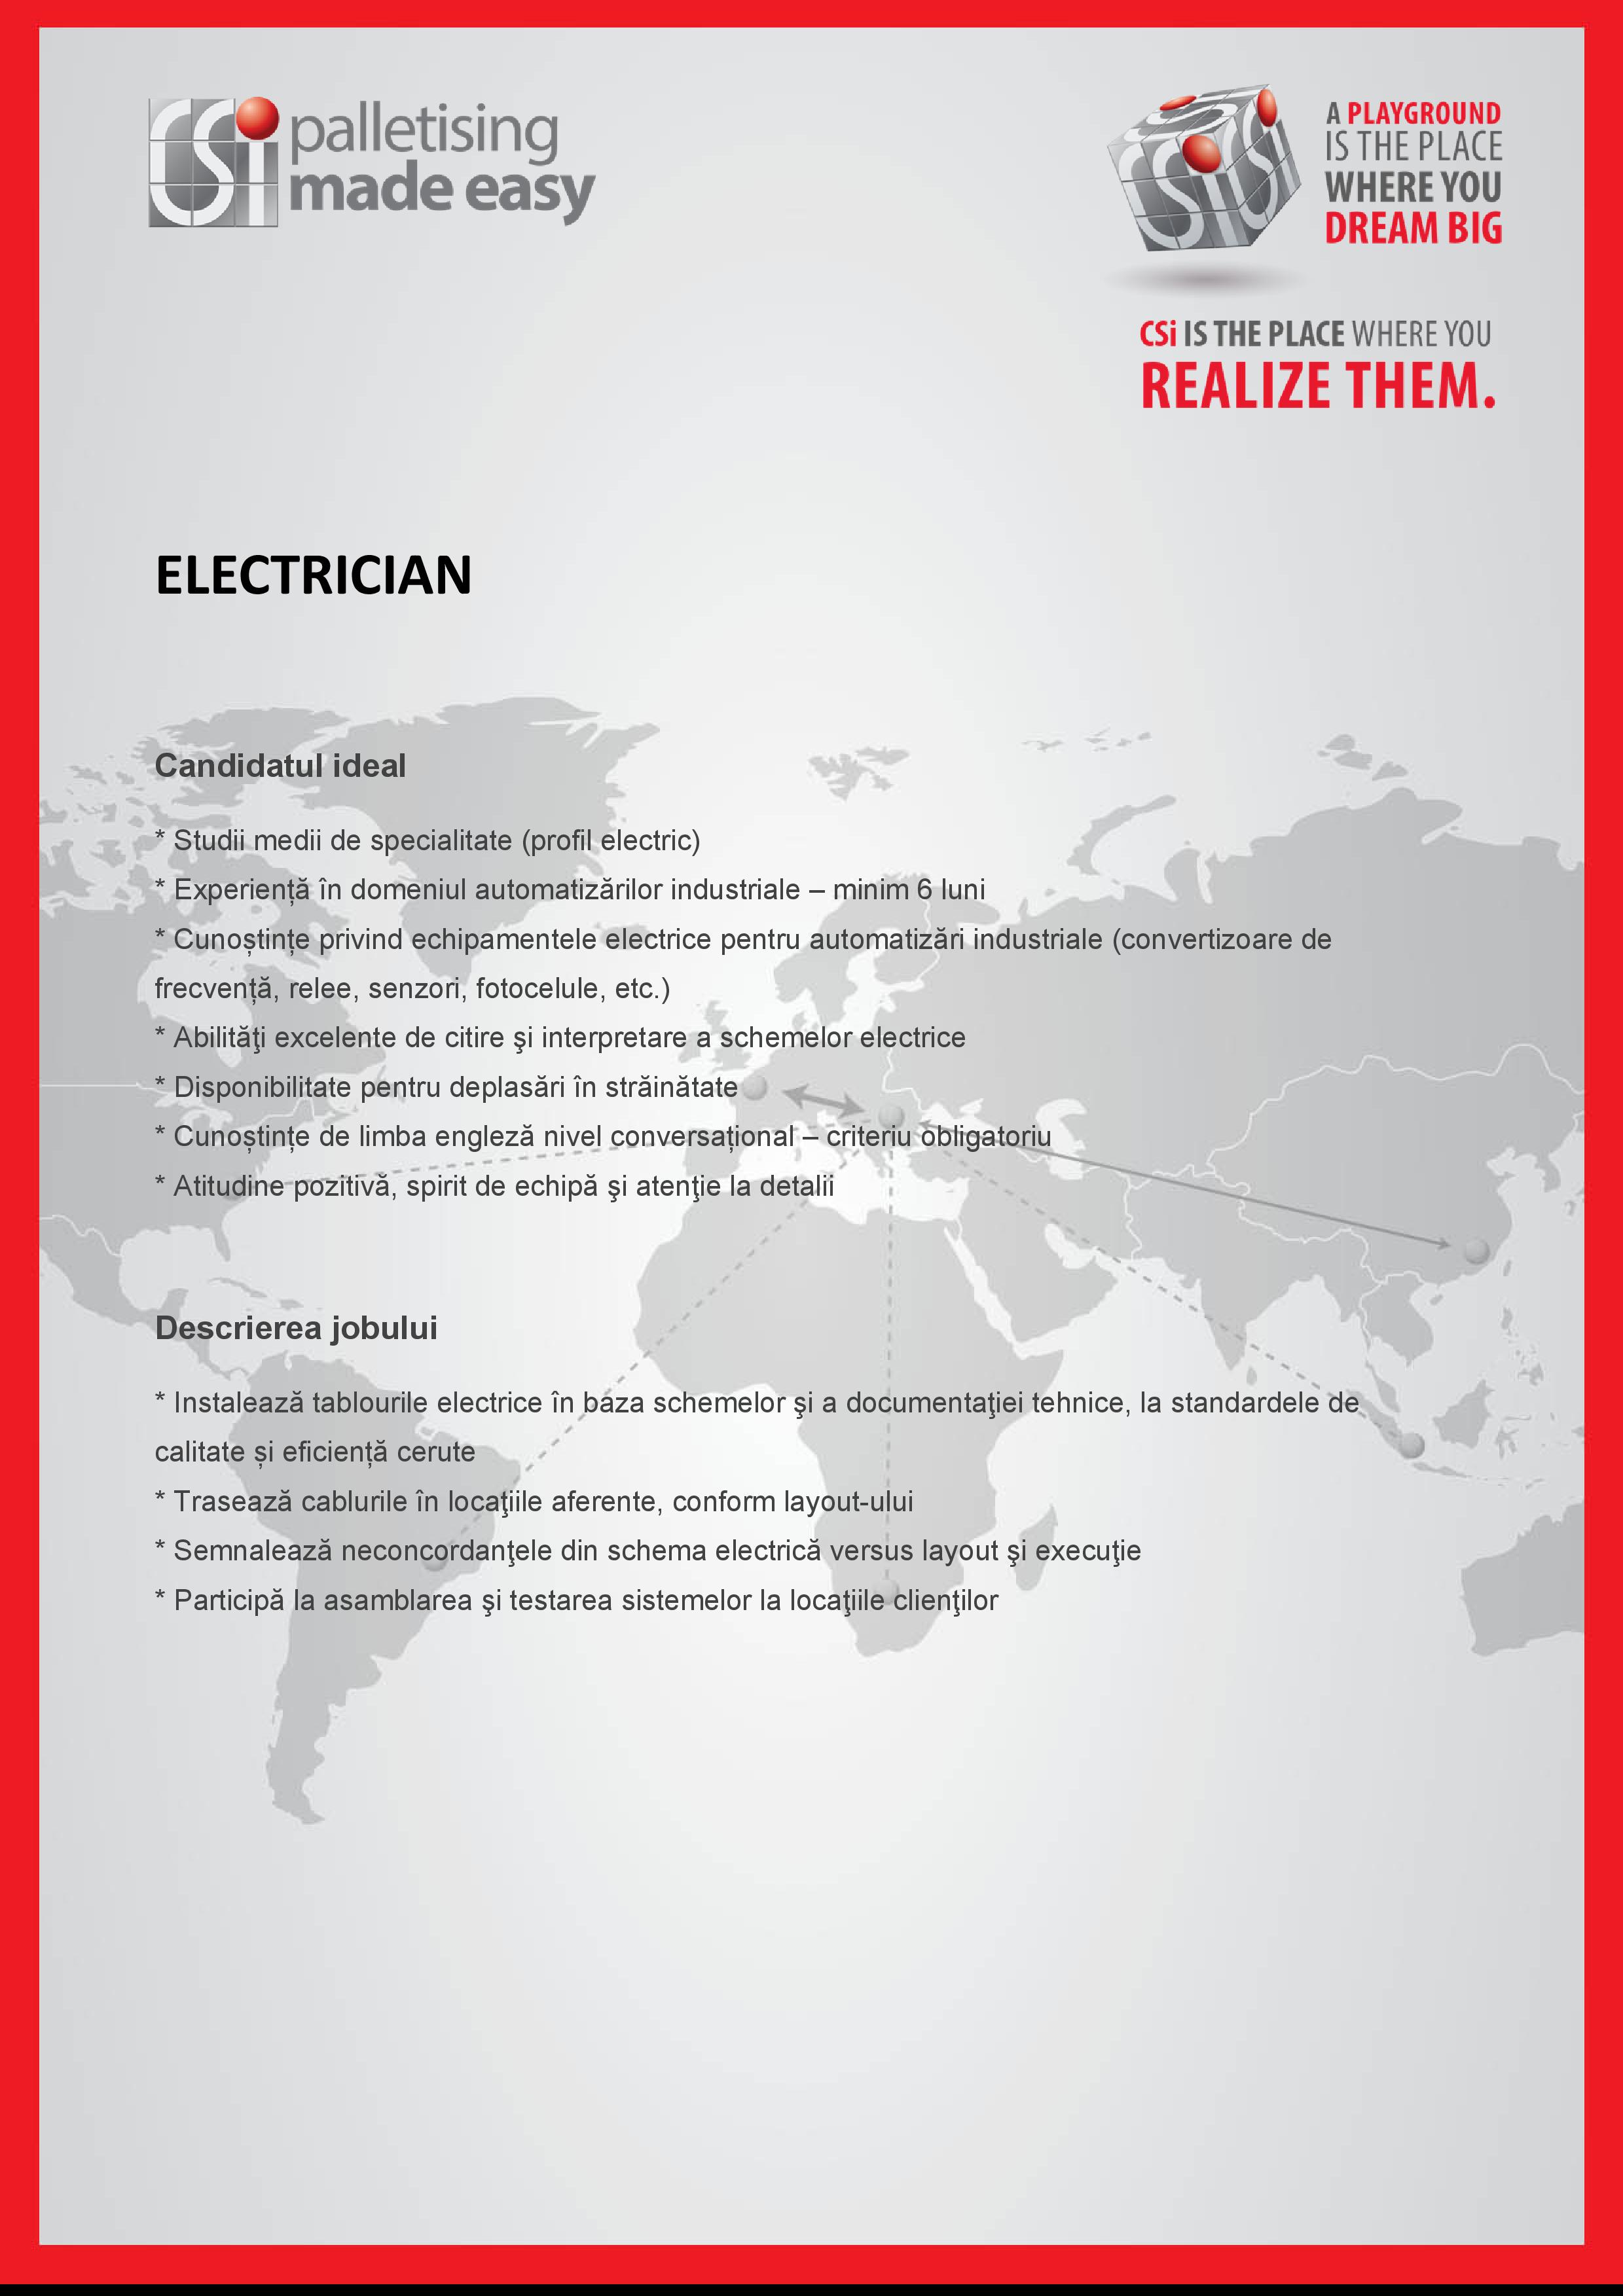 JD Electrician